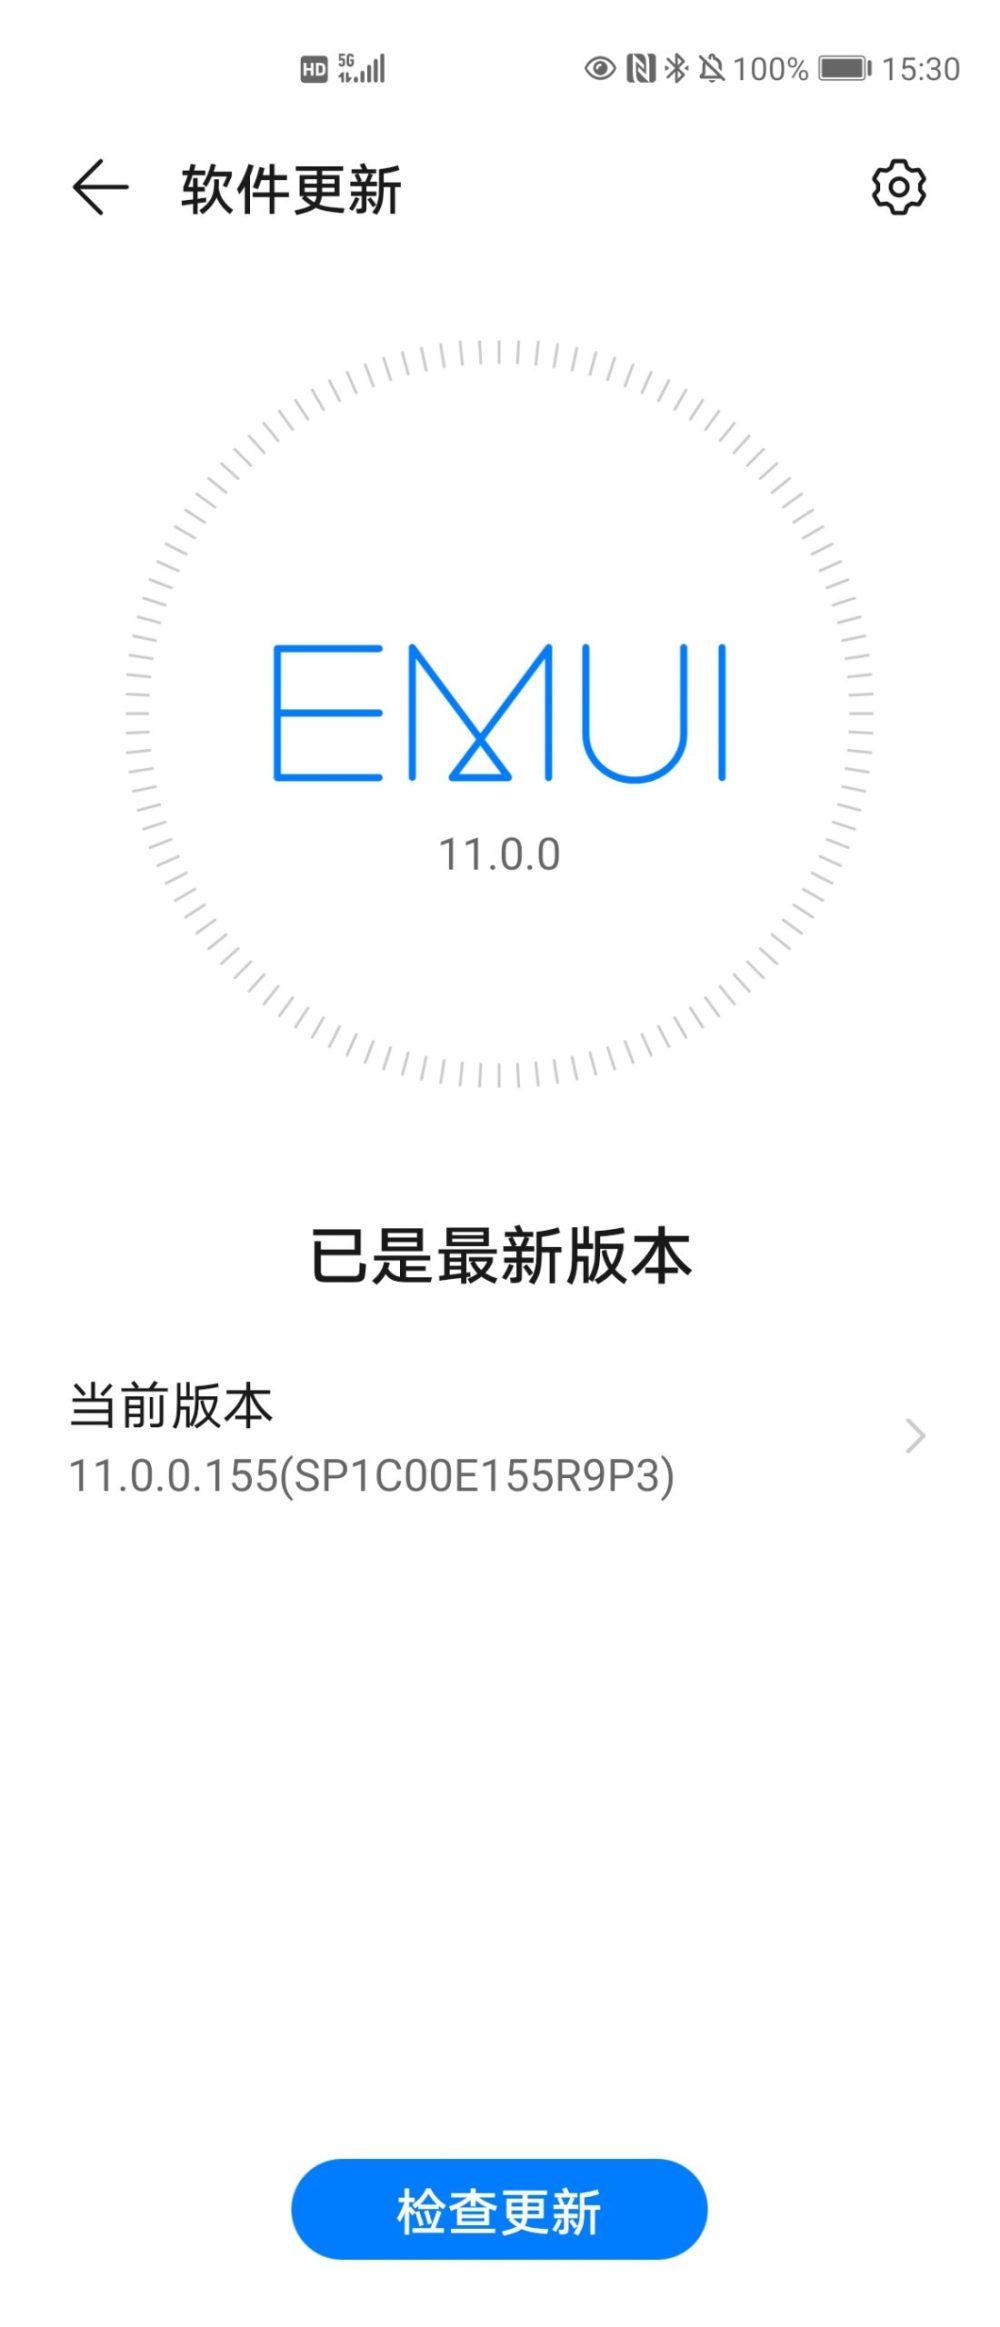 Huawei Mate X2 EMUI 11.0.0.155 SP1